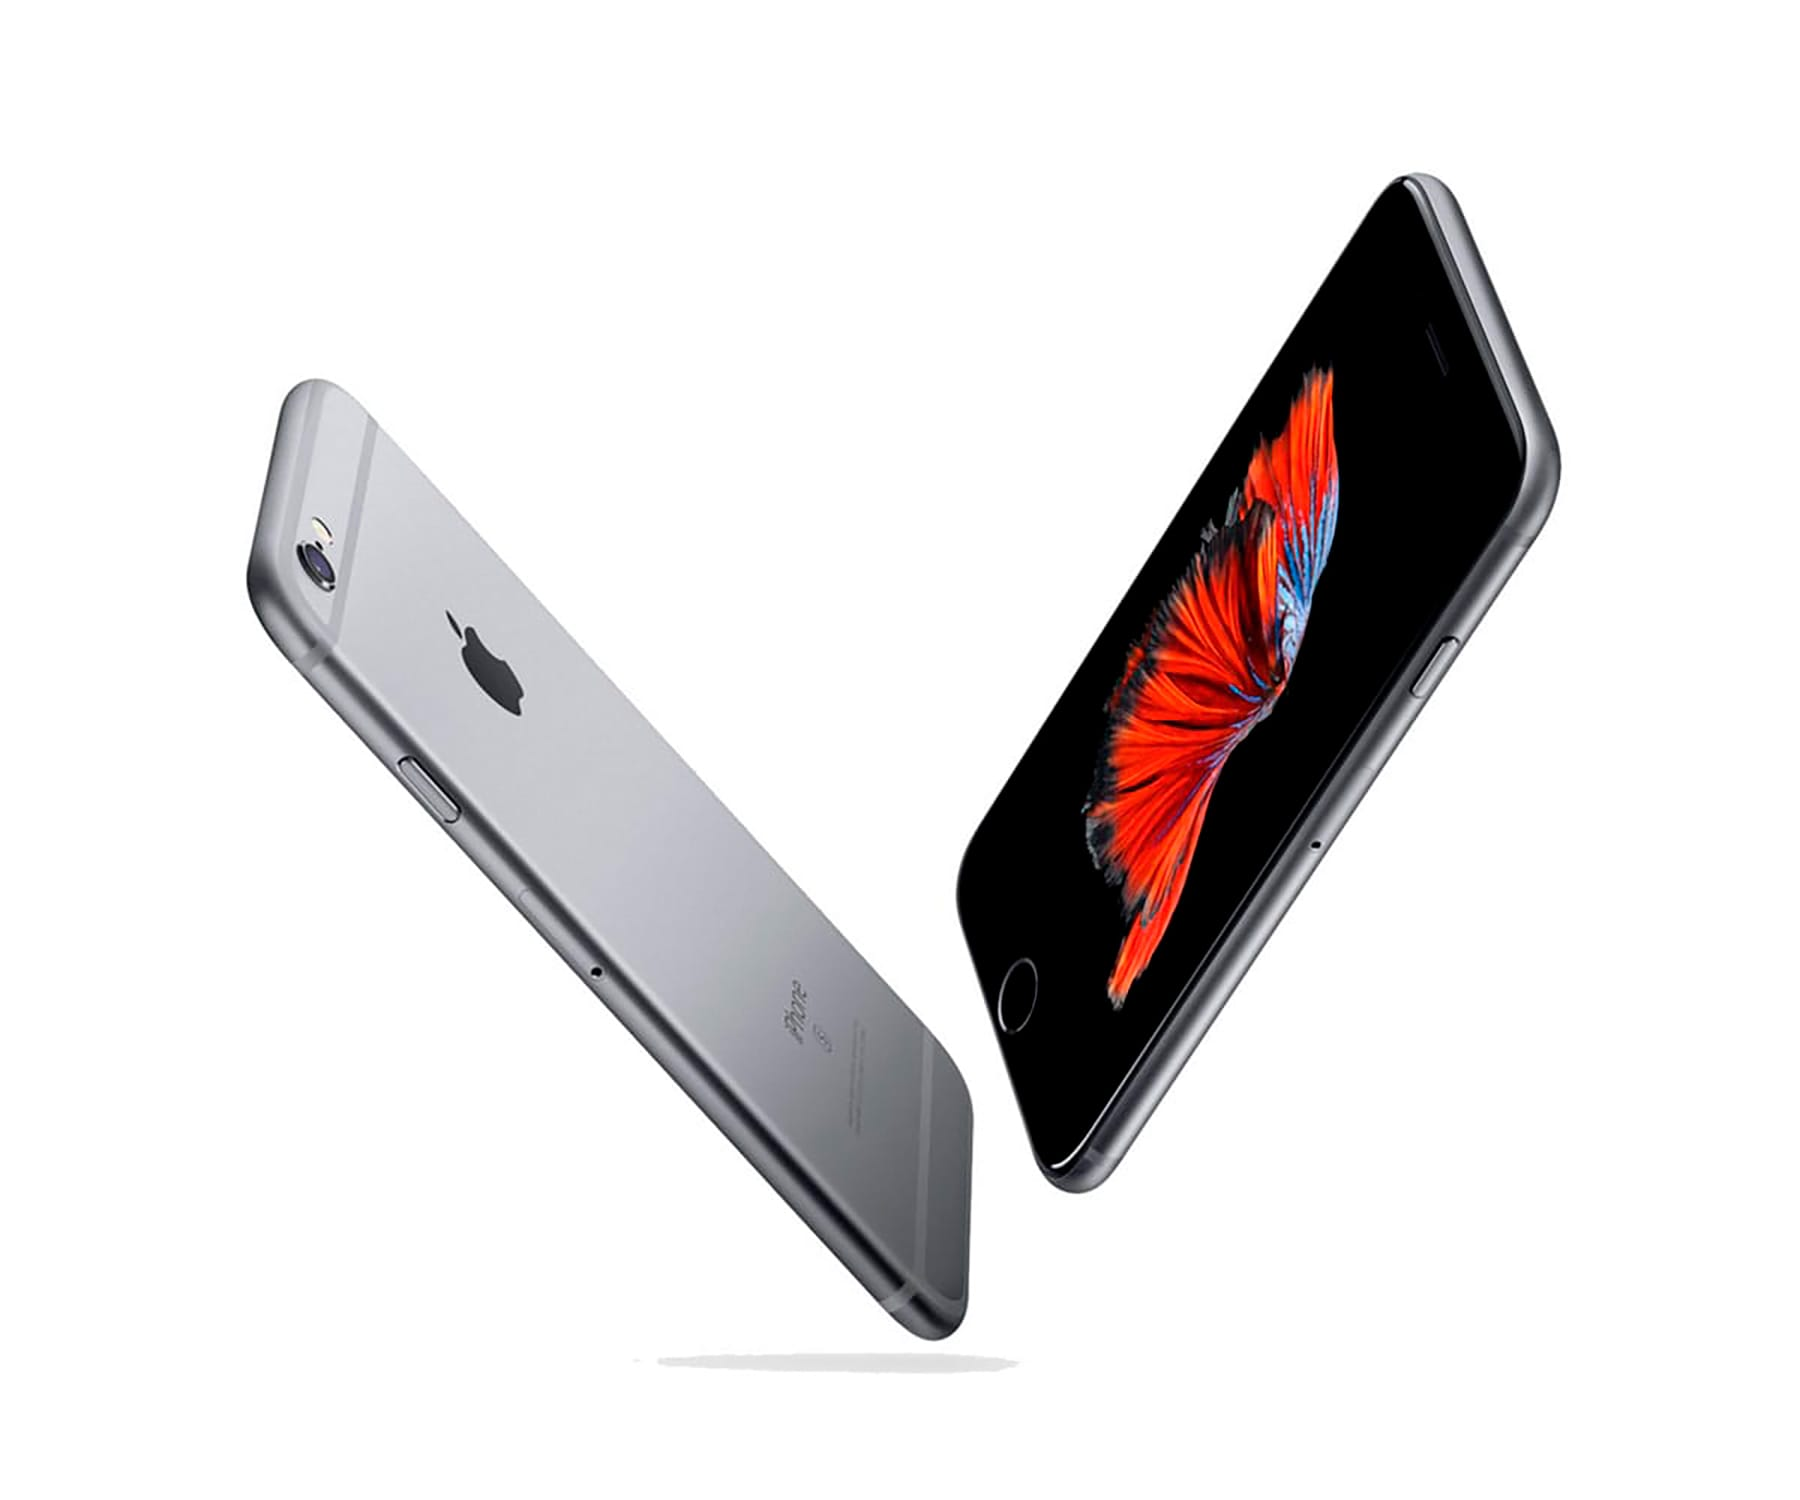 Apple Iphone 6s 64gb Gris Espacial Reacondicionado Cpo Móvil 4g 4.7'' Retina Hd/... (2)